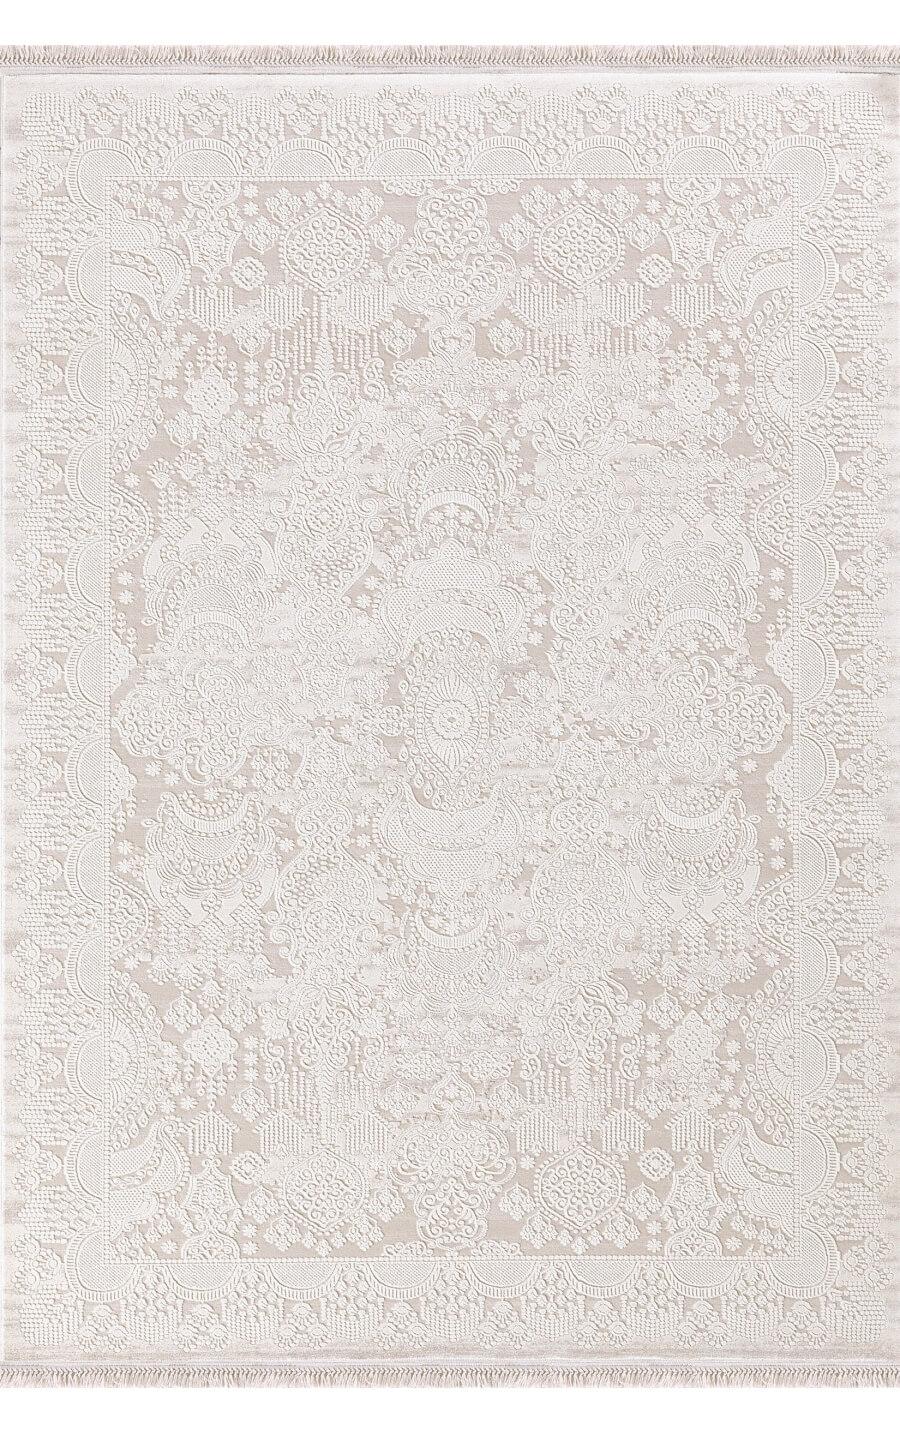 DİNARSU HALI ARORA 31885-060 Dinarsu Halı Dinarsu Halı Fiyatları